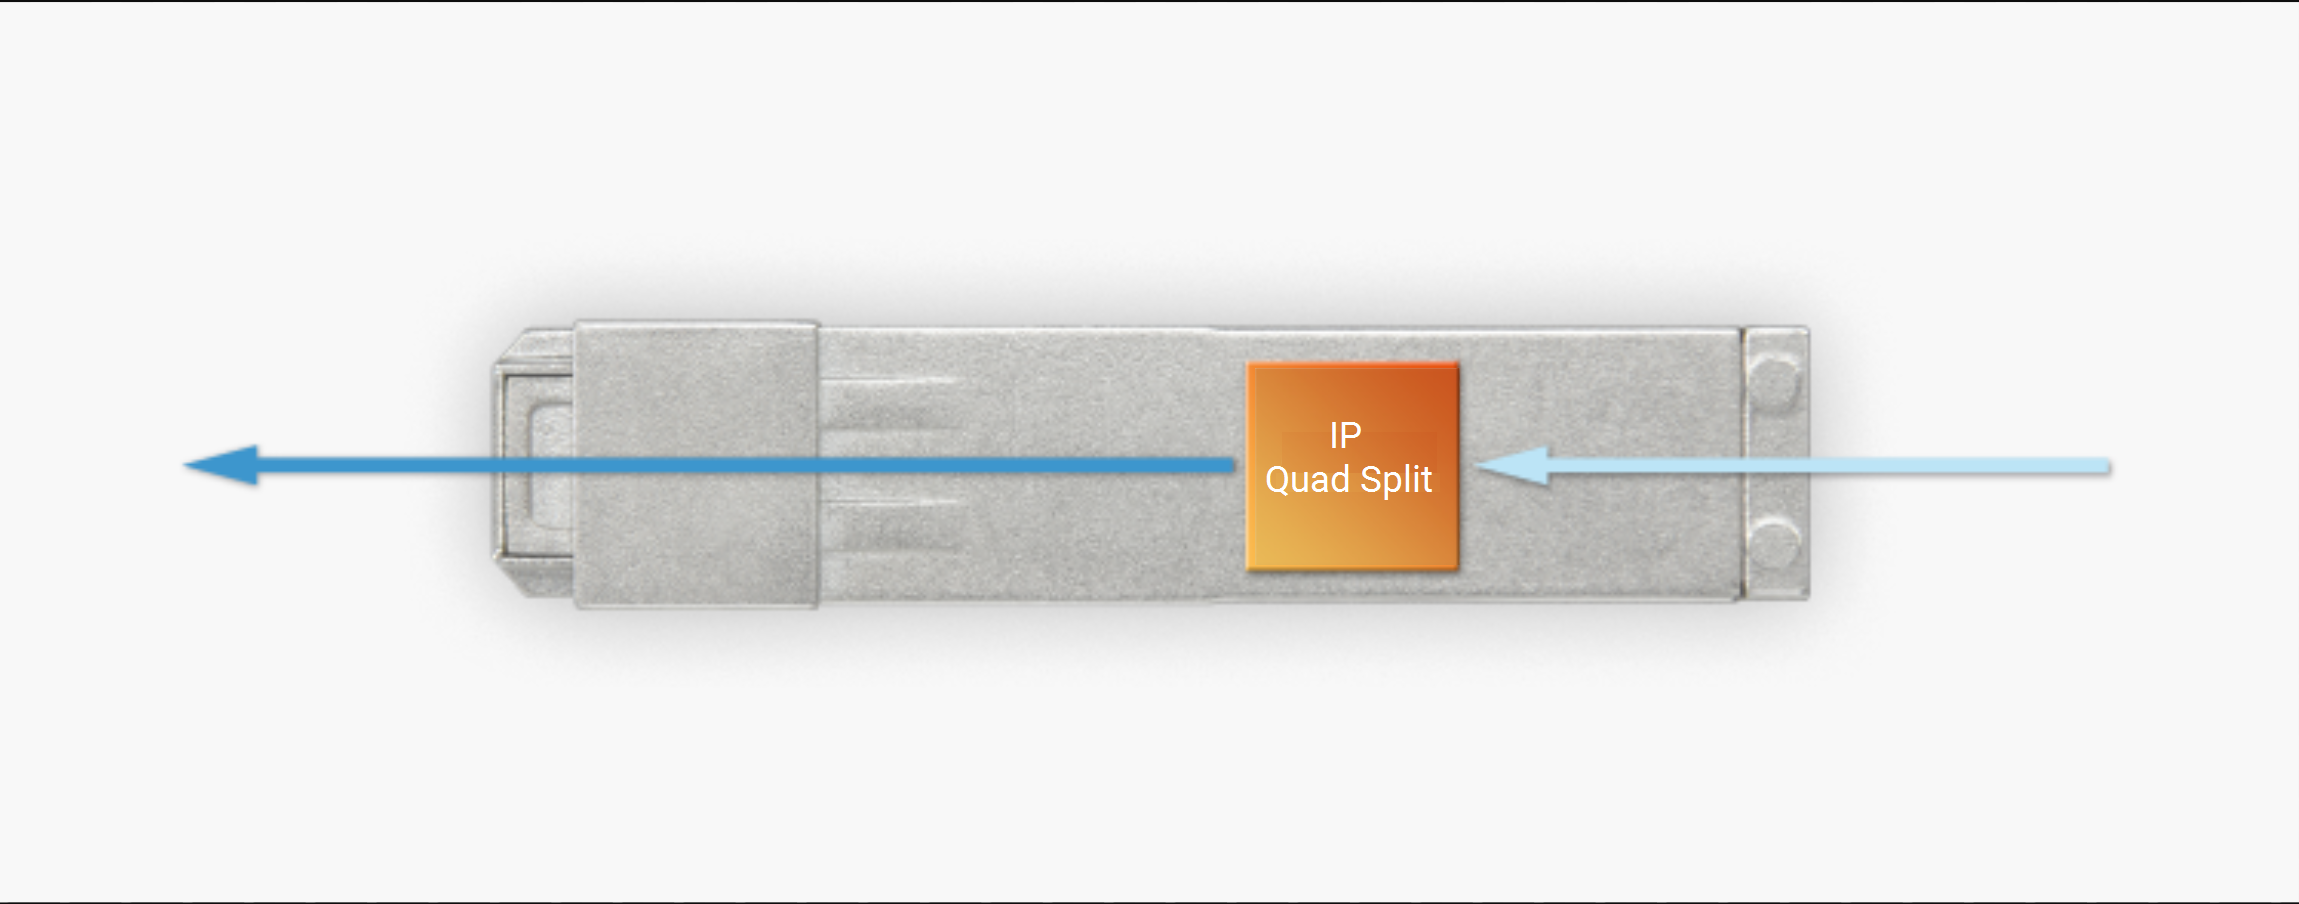 Standalone Ip Gateways  Multiviewers   Quad Split  Emview